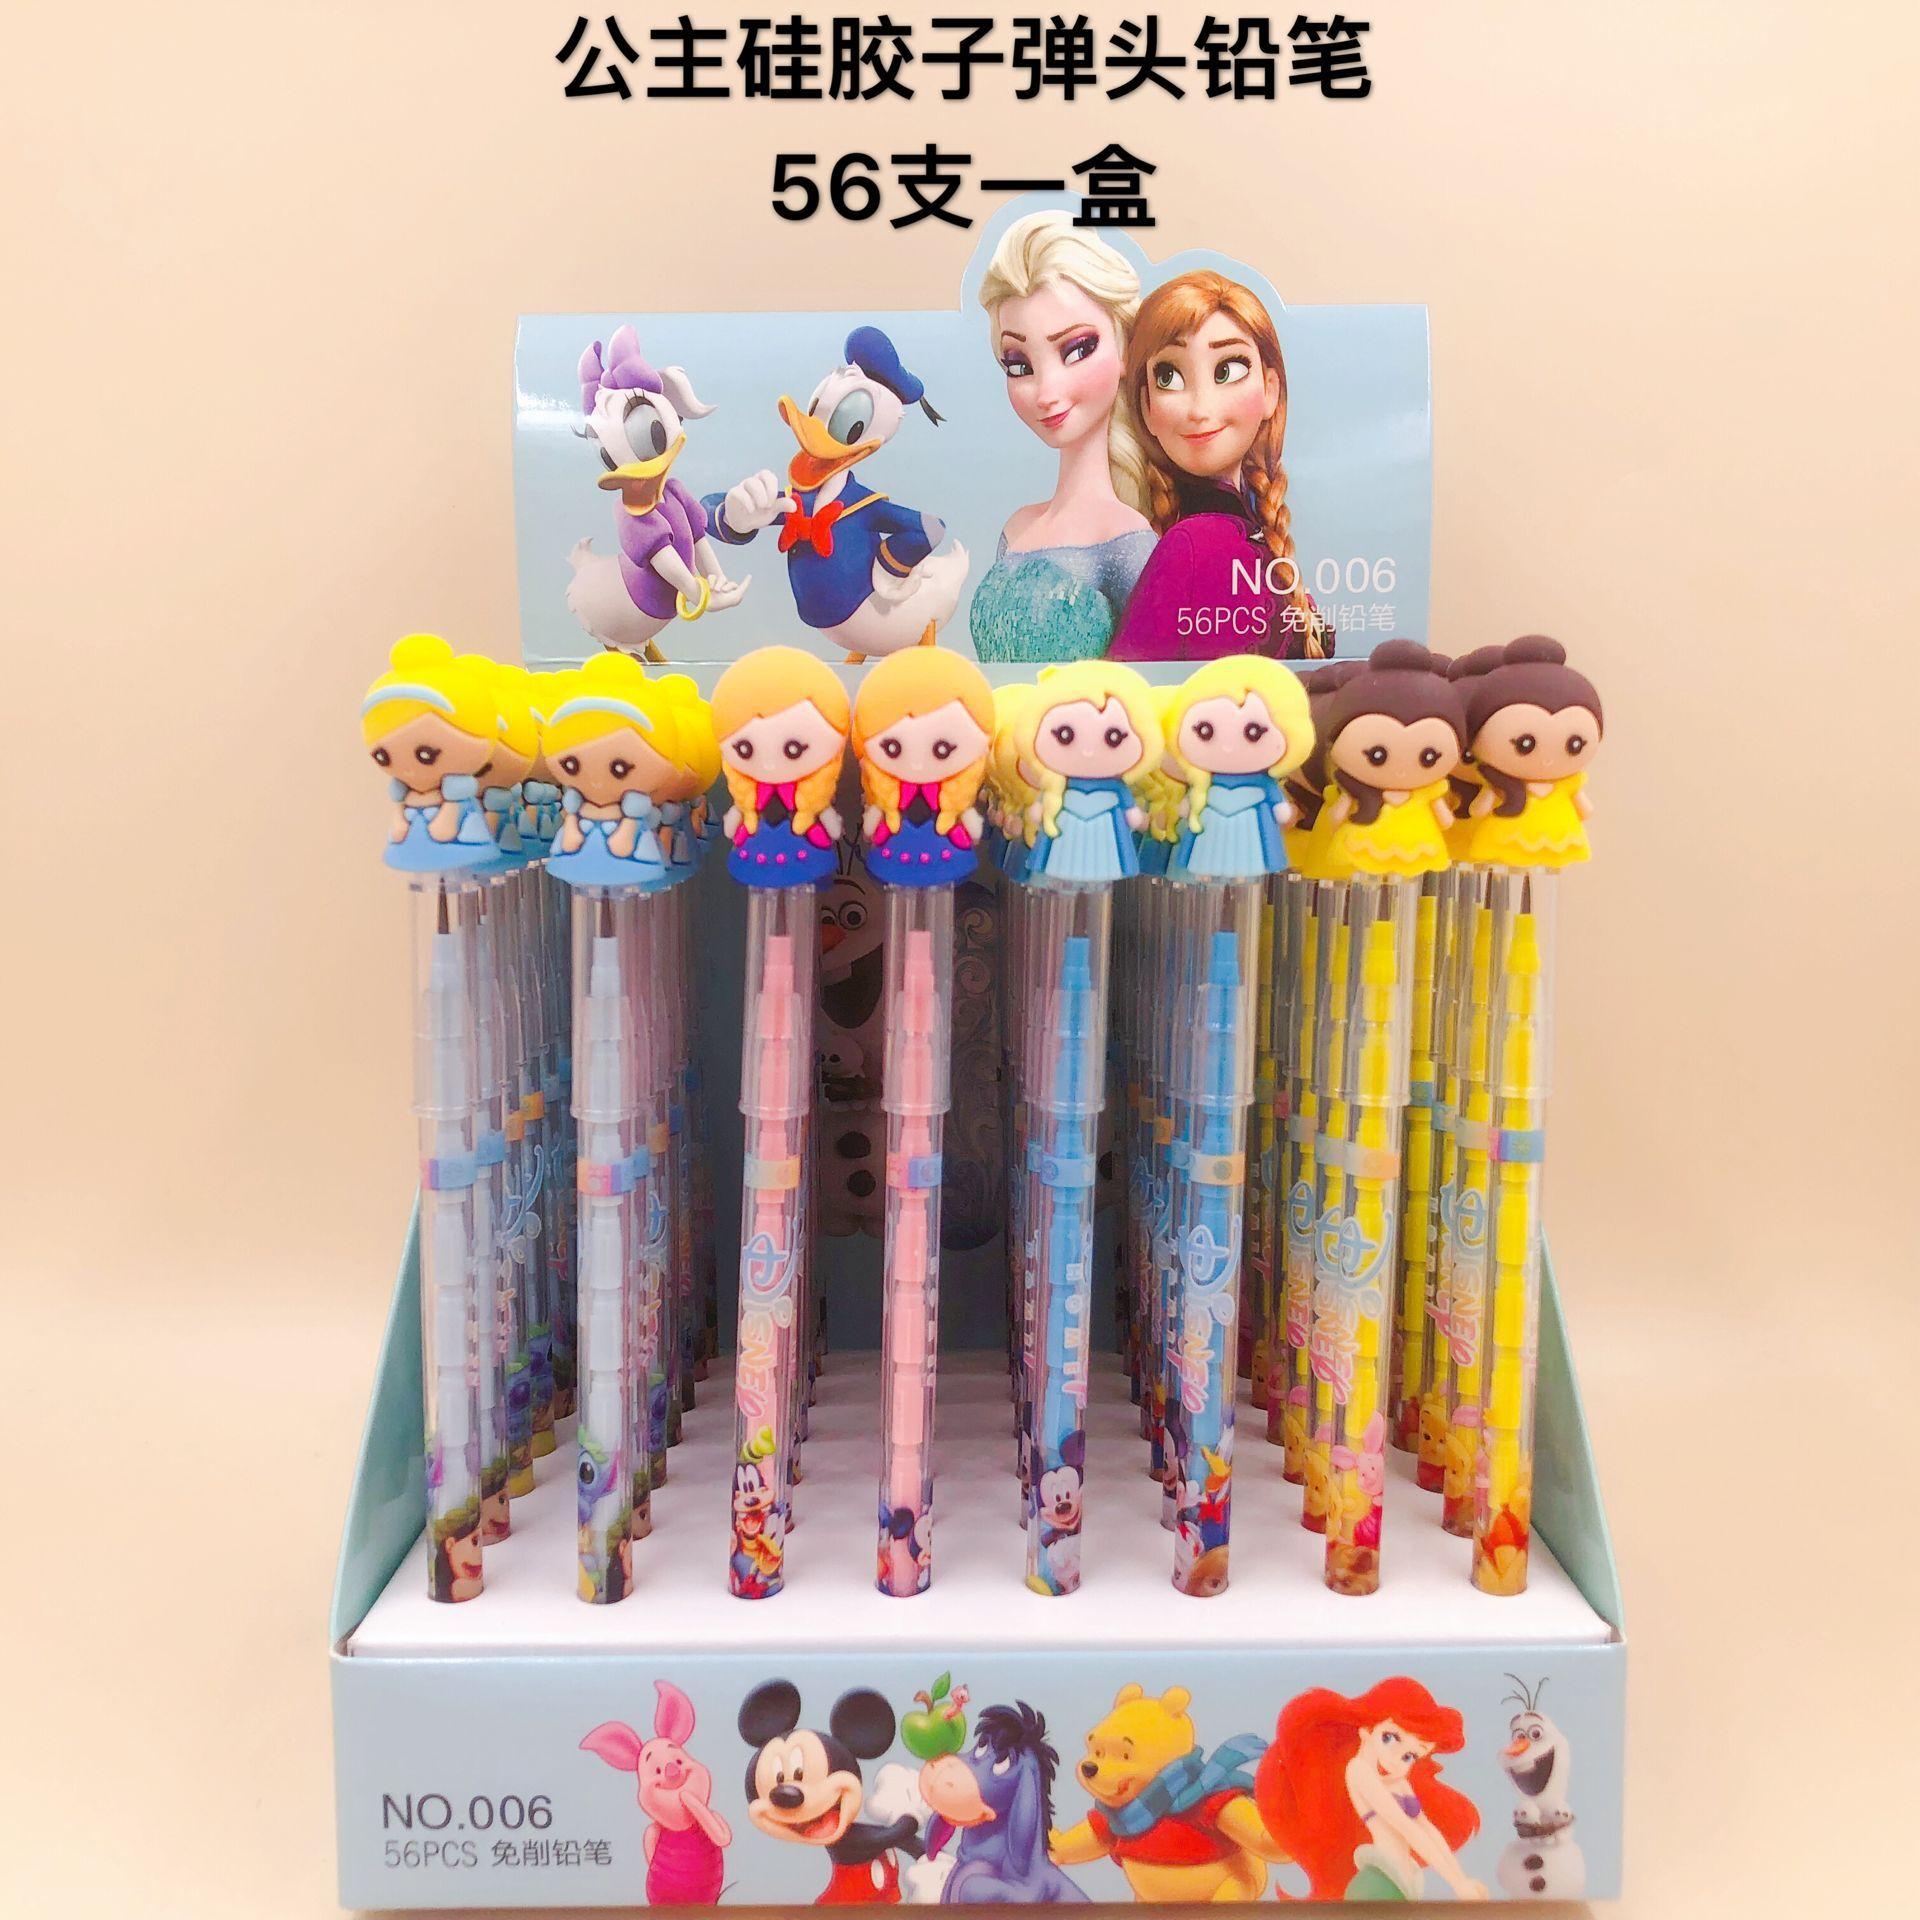 56pcs Disney Frozen Cute Cartoon Pencil Princess Bullet Pencil Pencil Boys and Girls Writing Painting School Office Gift Prize